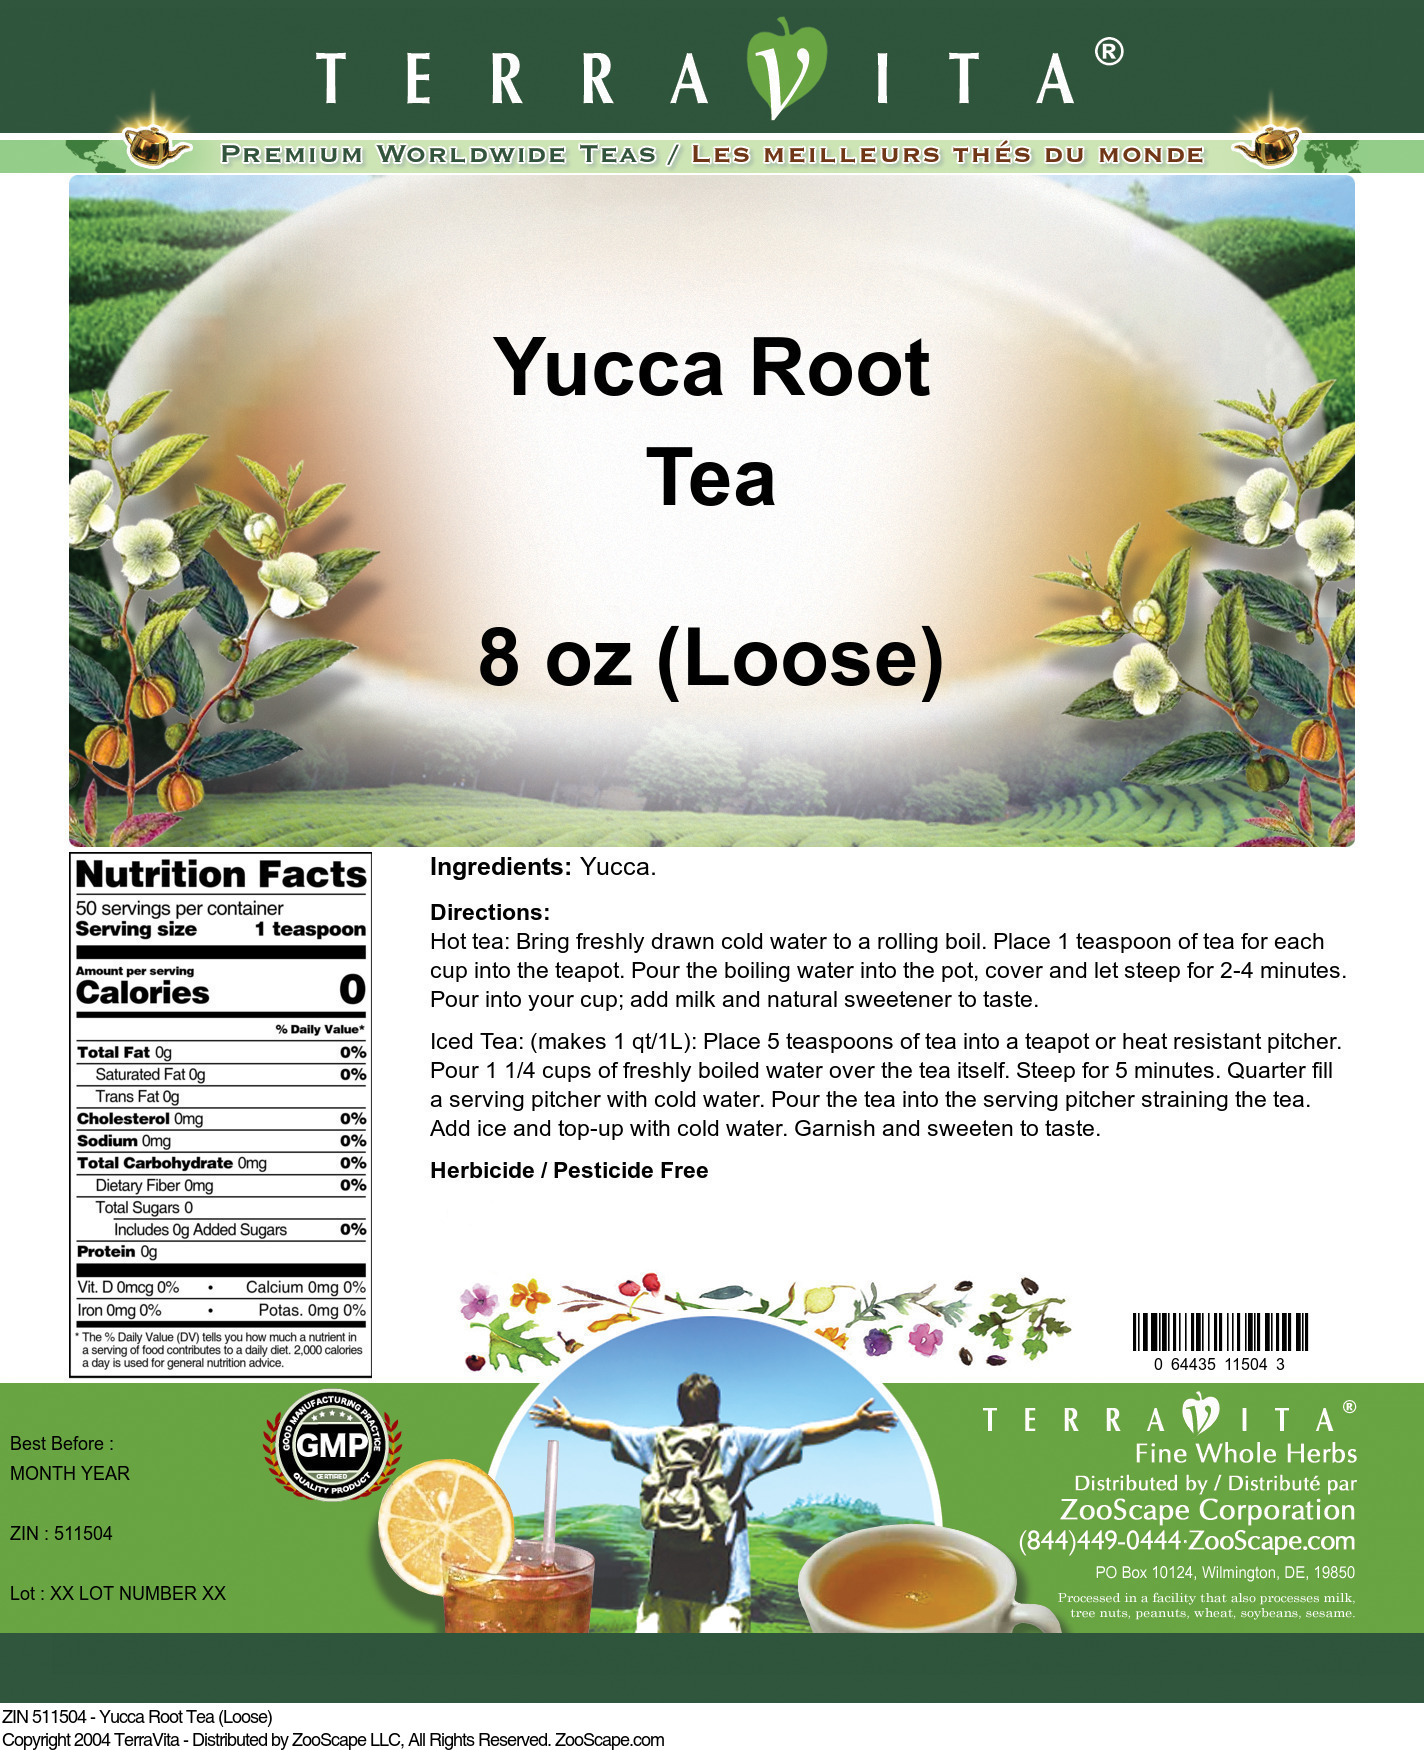 Yucca Root Tea (Loose)